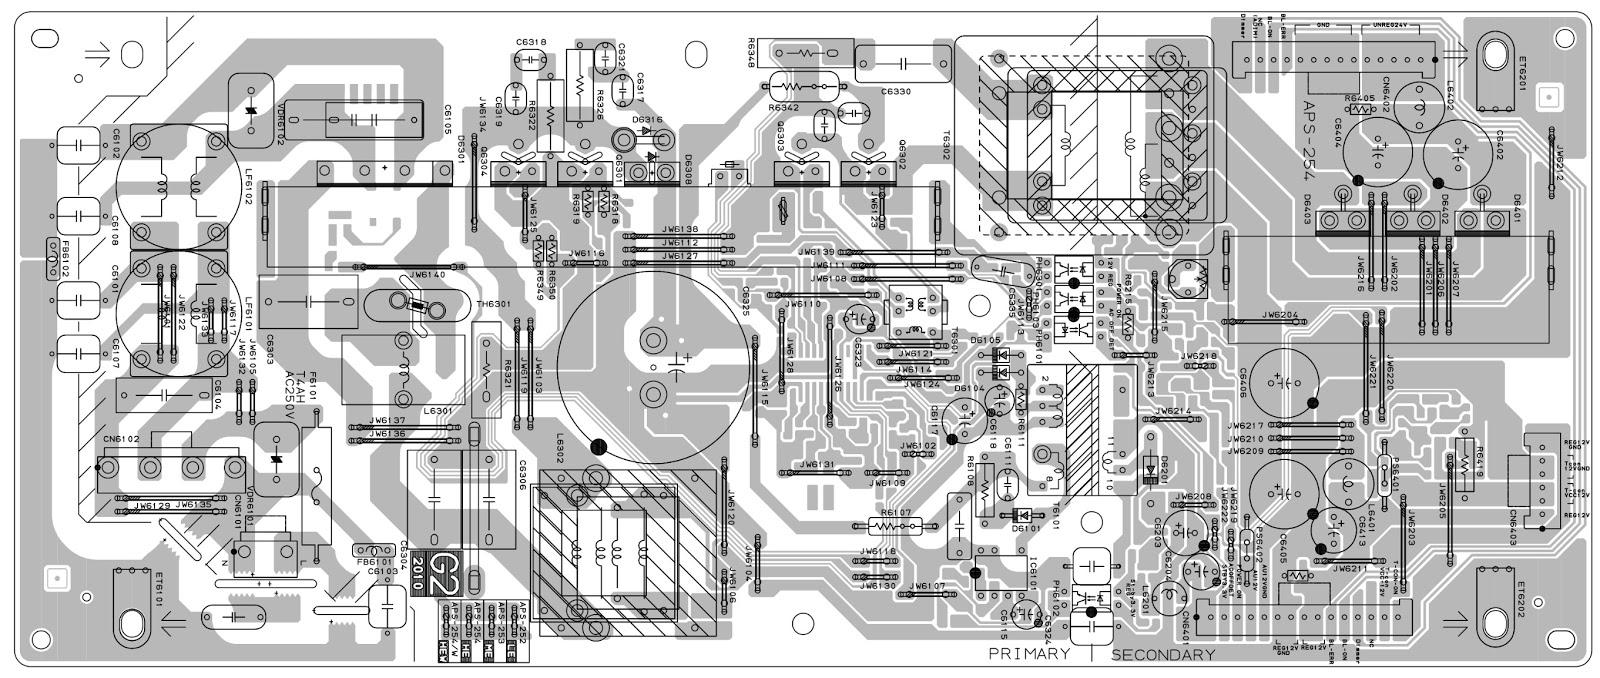 Electro Help  Sony Klv-32bx300 - Klv-40bx400 - Main Power Smps